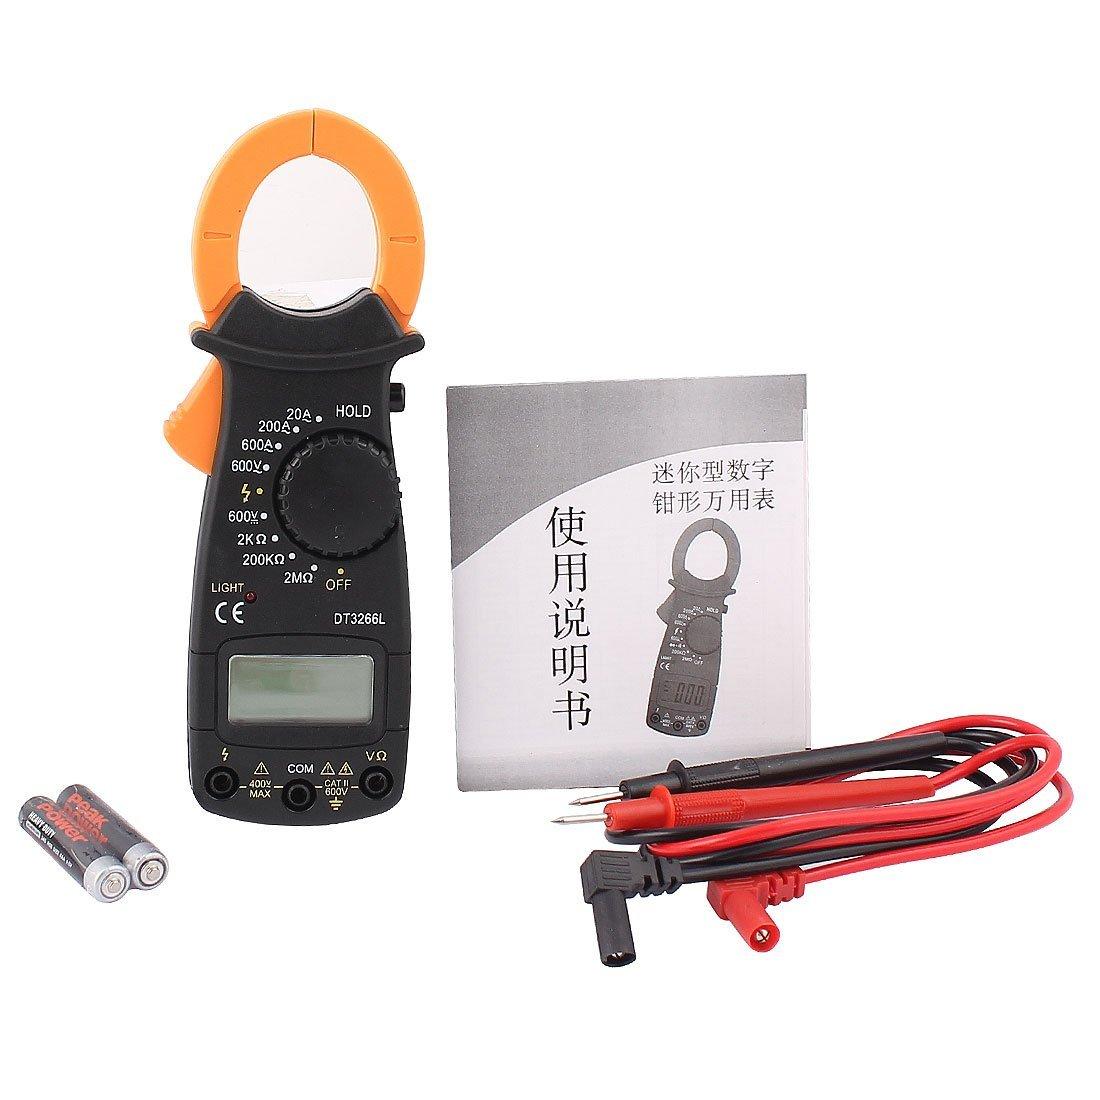 Fie Digital Clamp Meter : Digital clamp meter for v fire protection f ebay